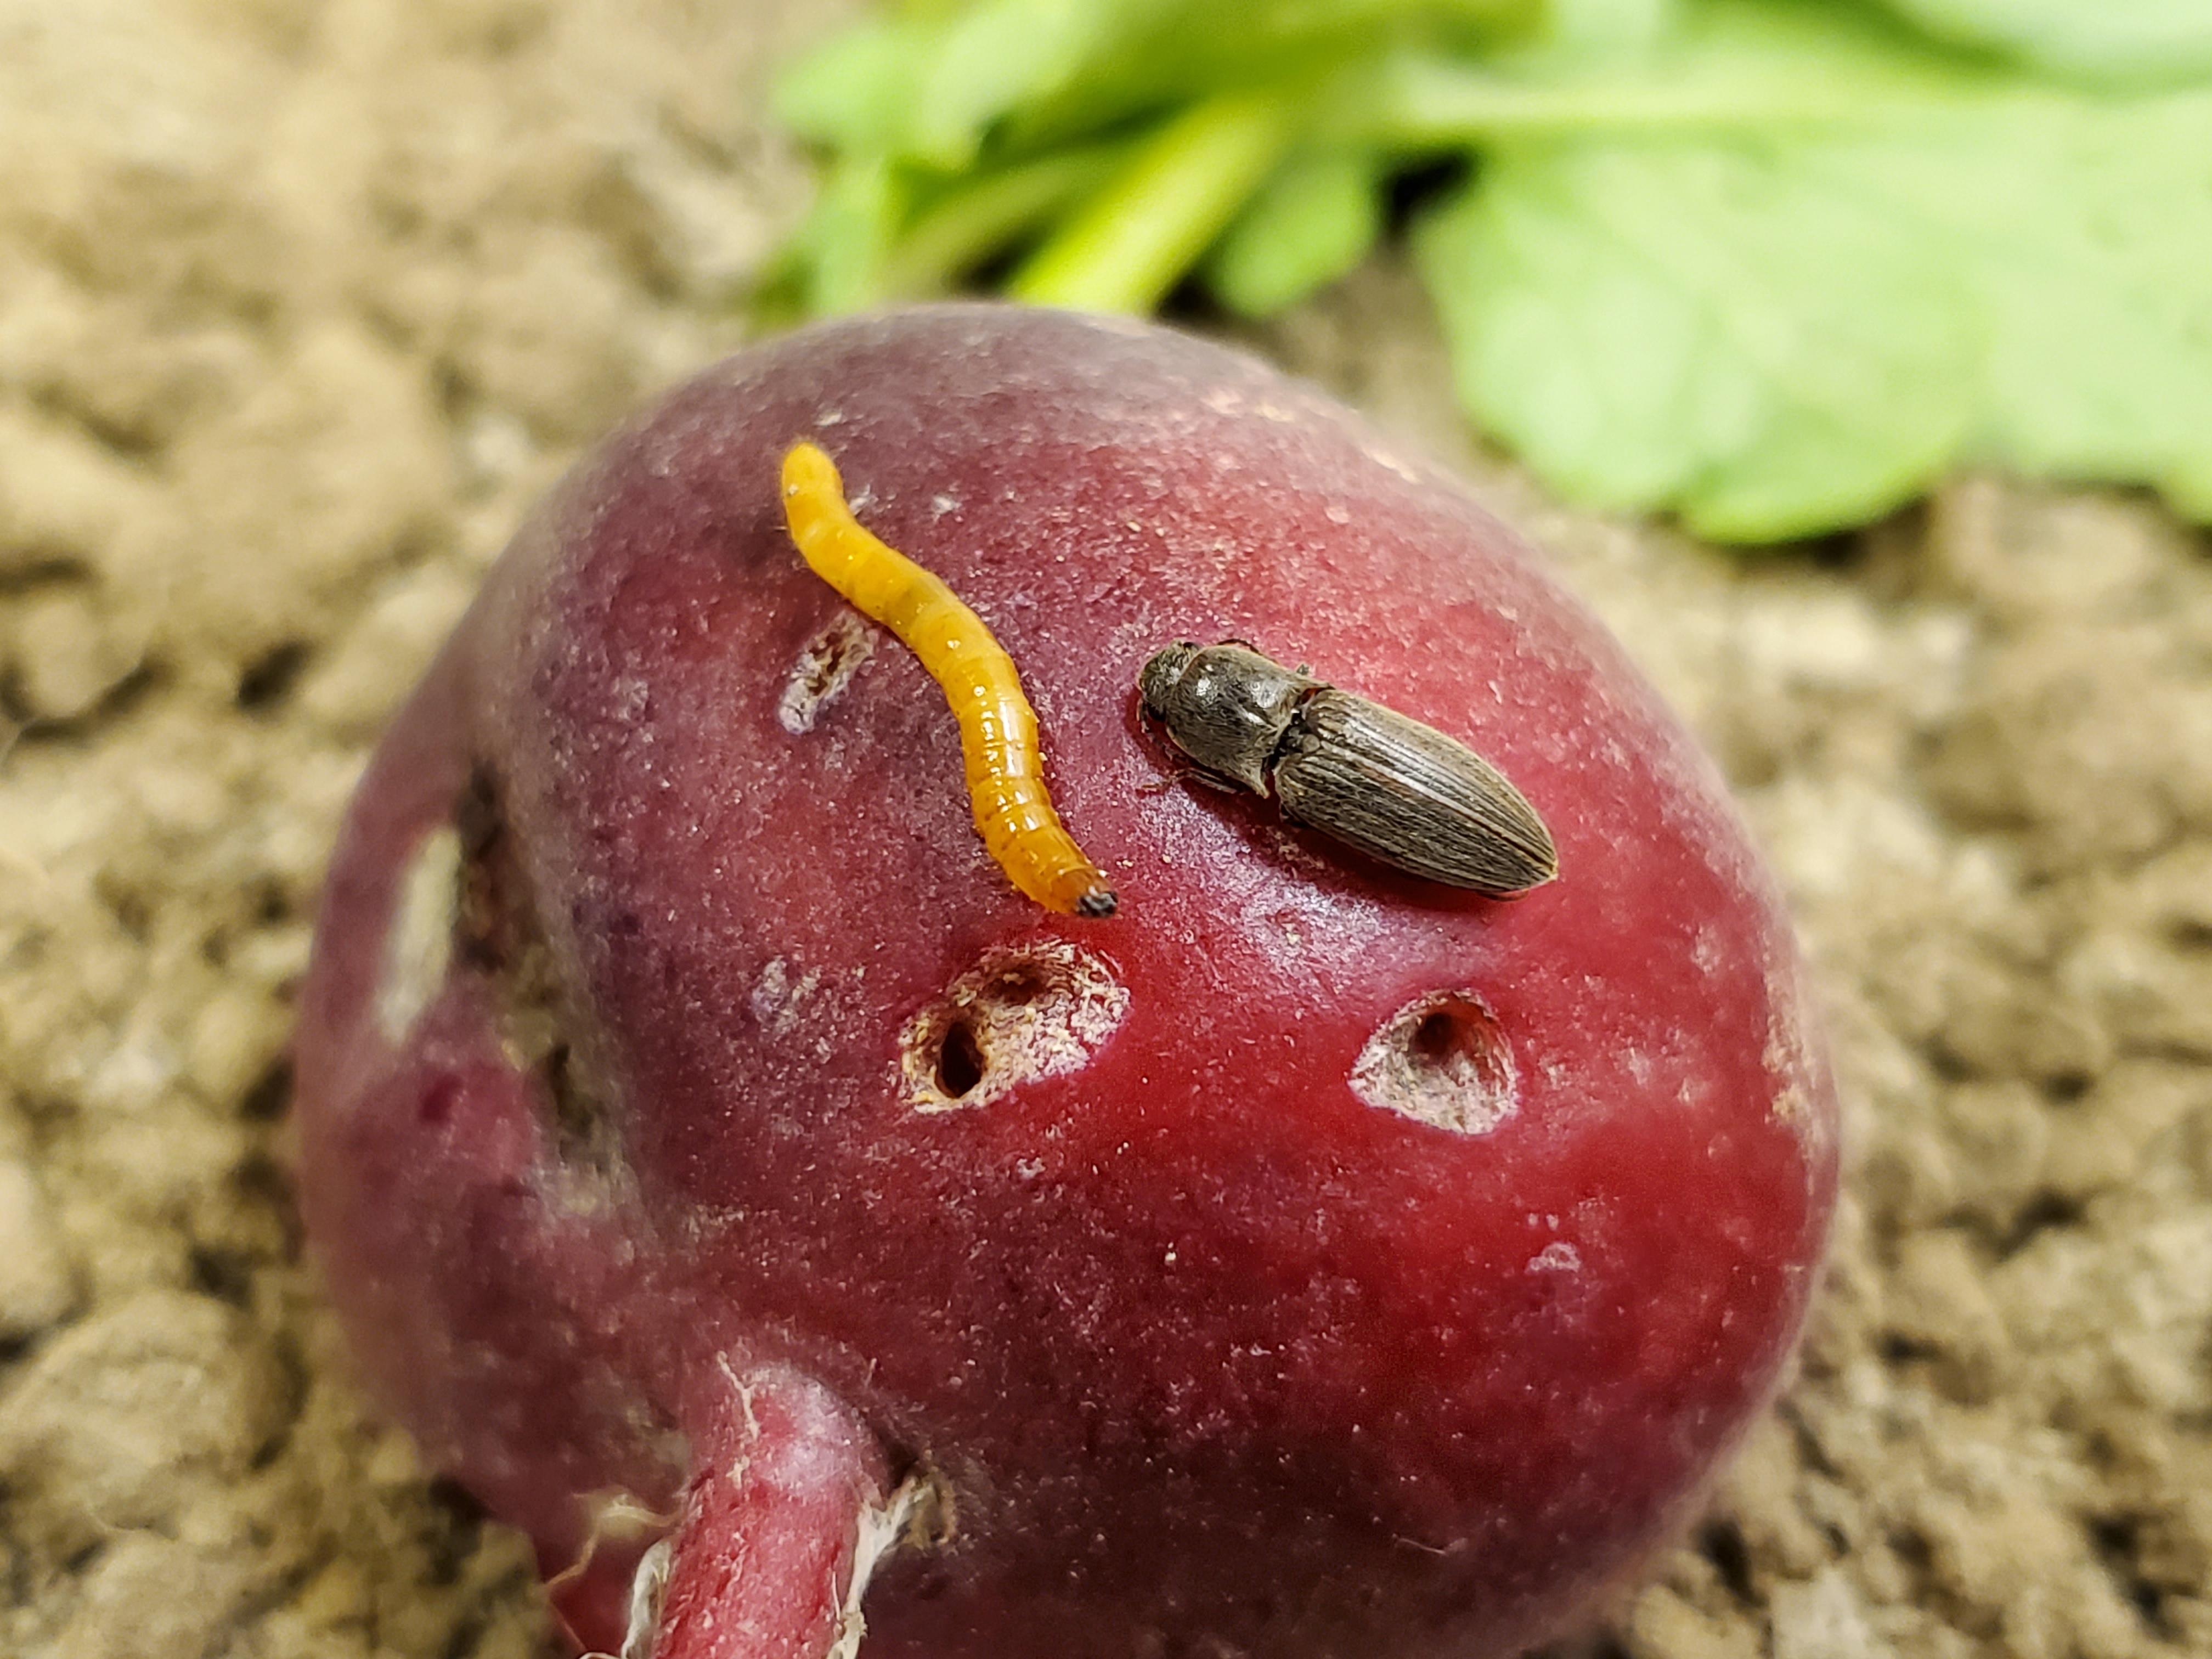 Wireworm adult and immature on radish.